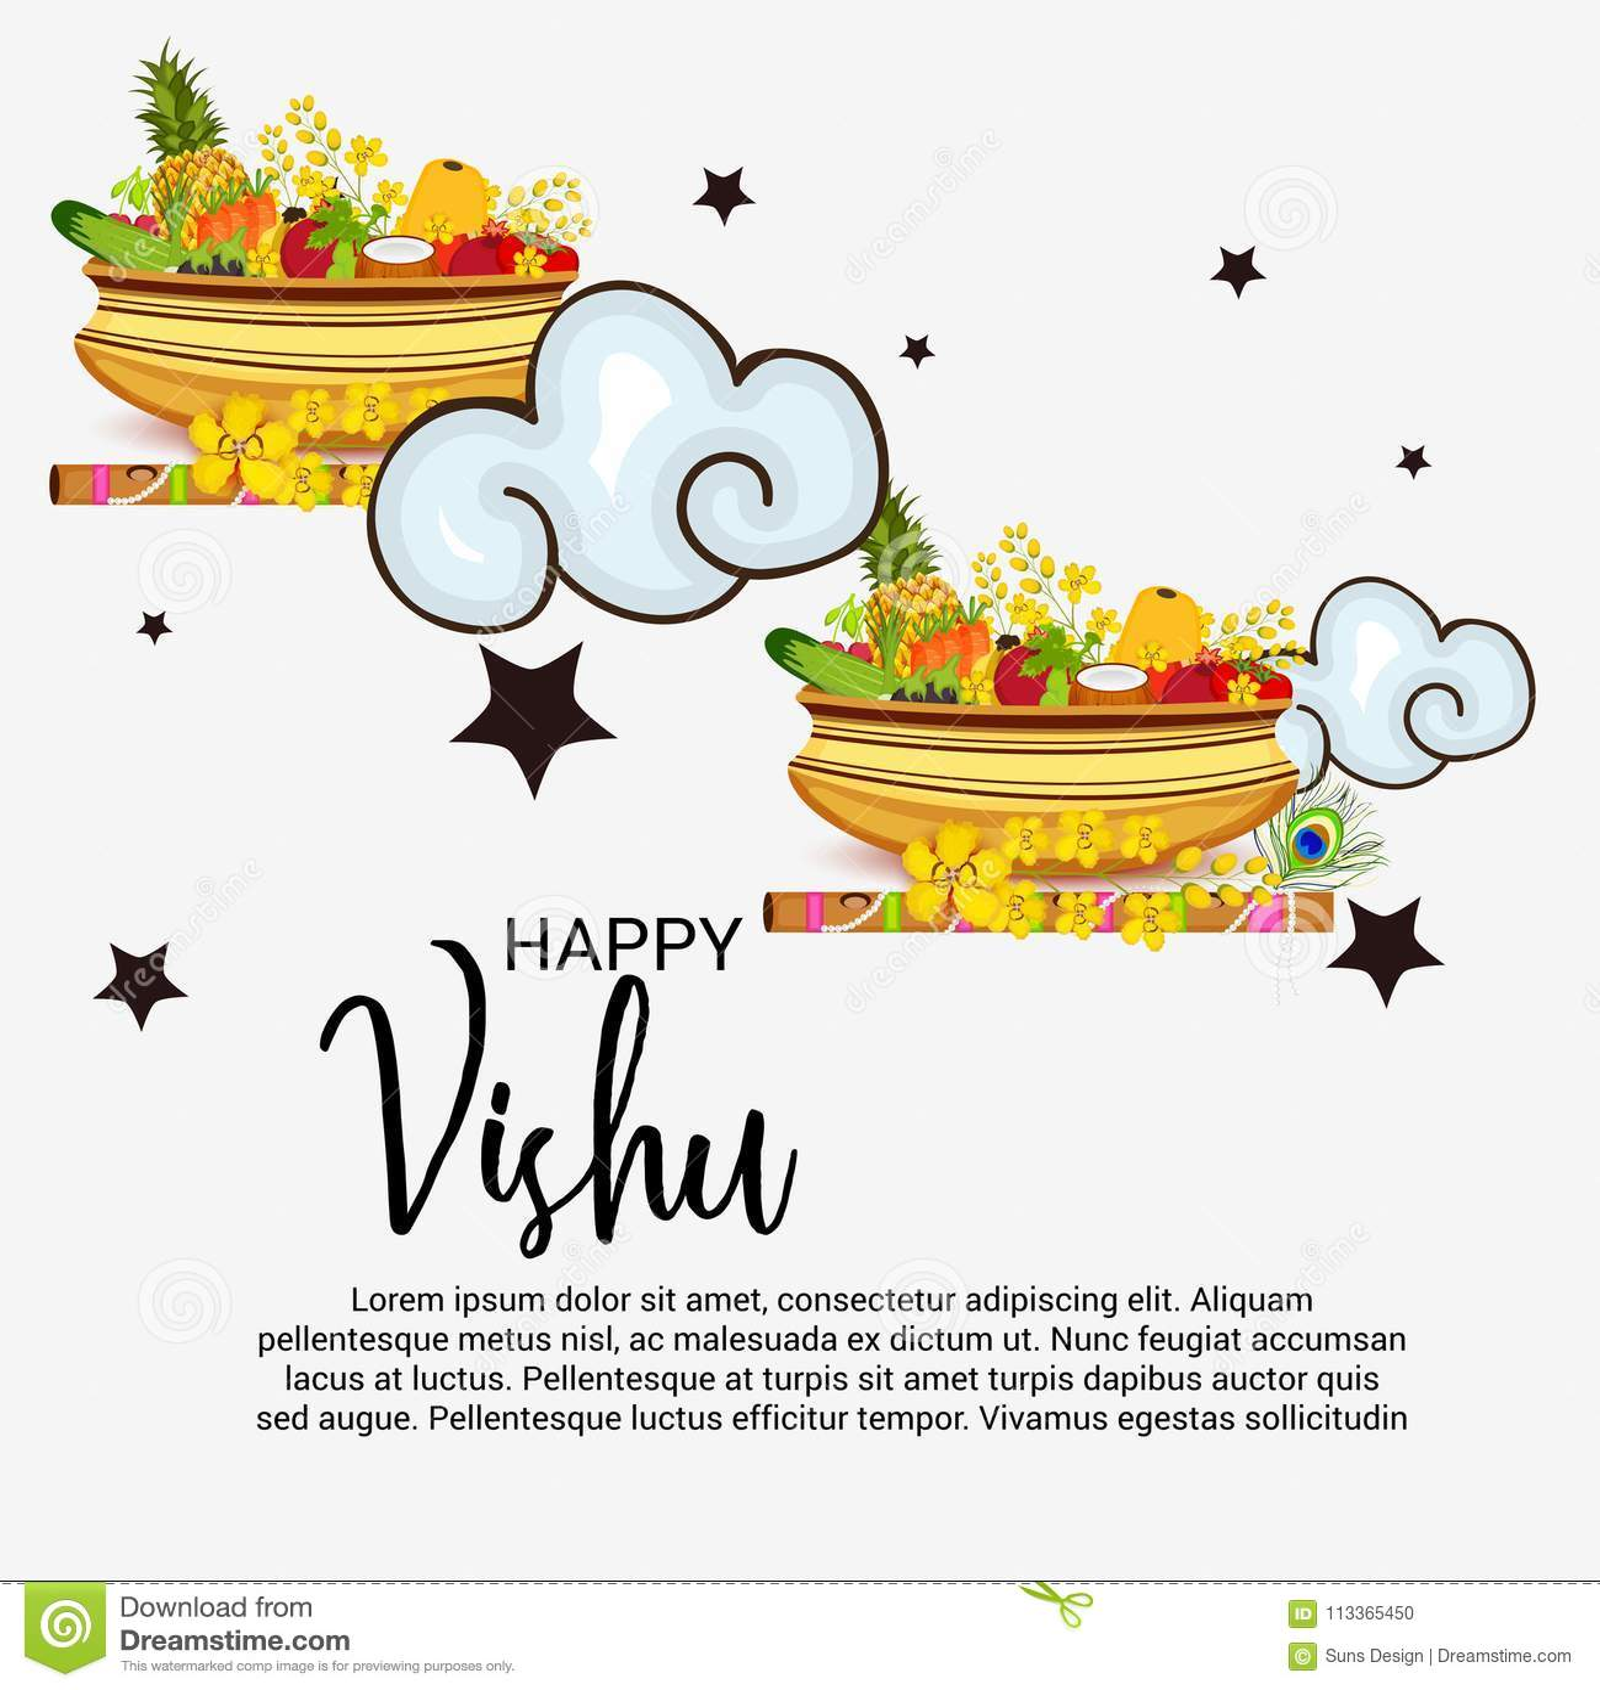 Happy Vishu Stock Illustration Illustration Of Design 113365450